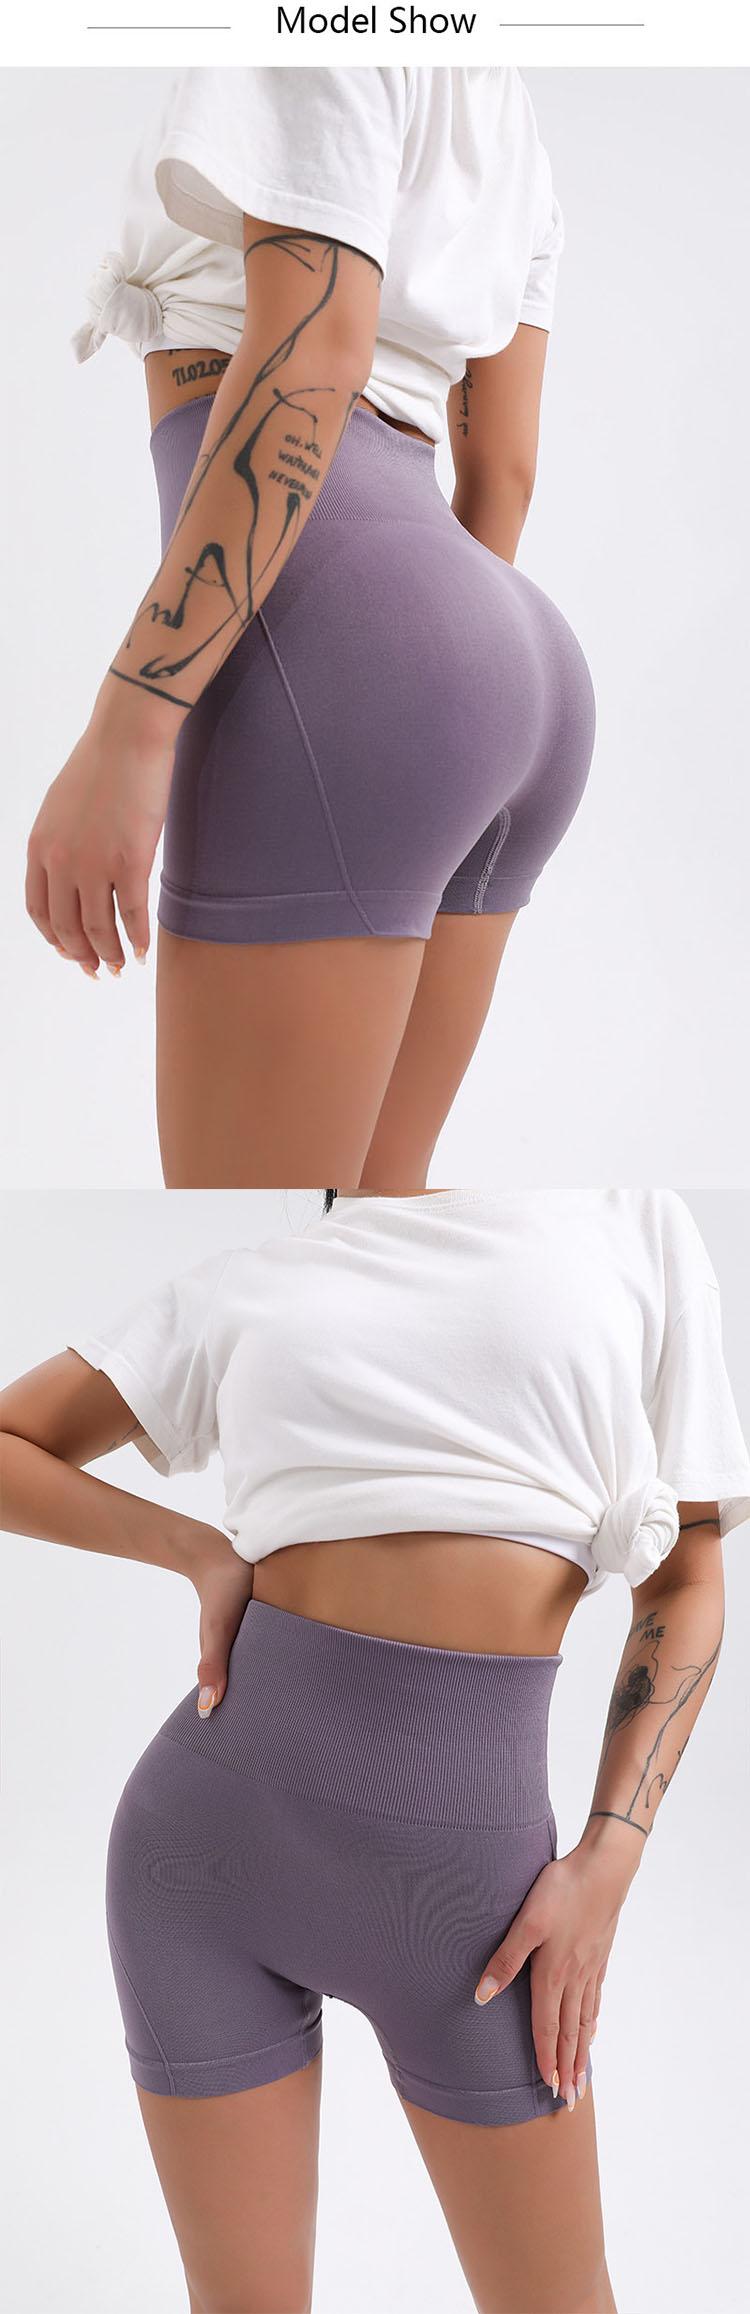 Hip design to create a sexy peach buttocks.